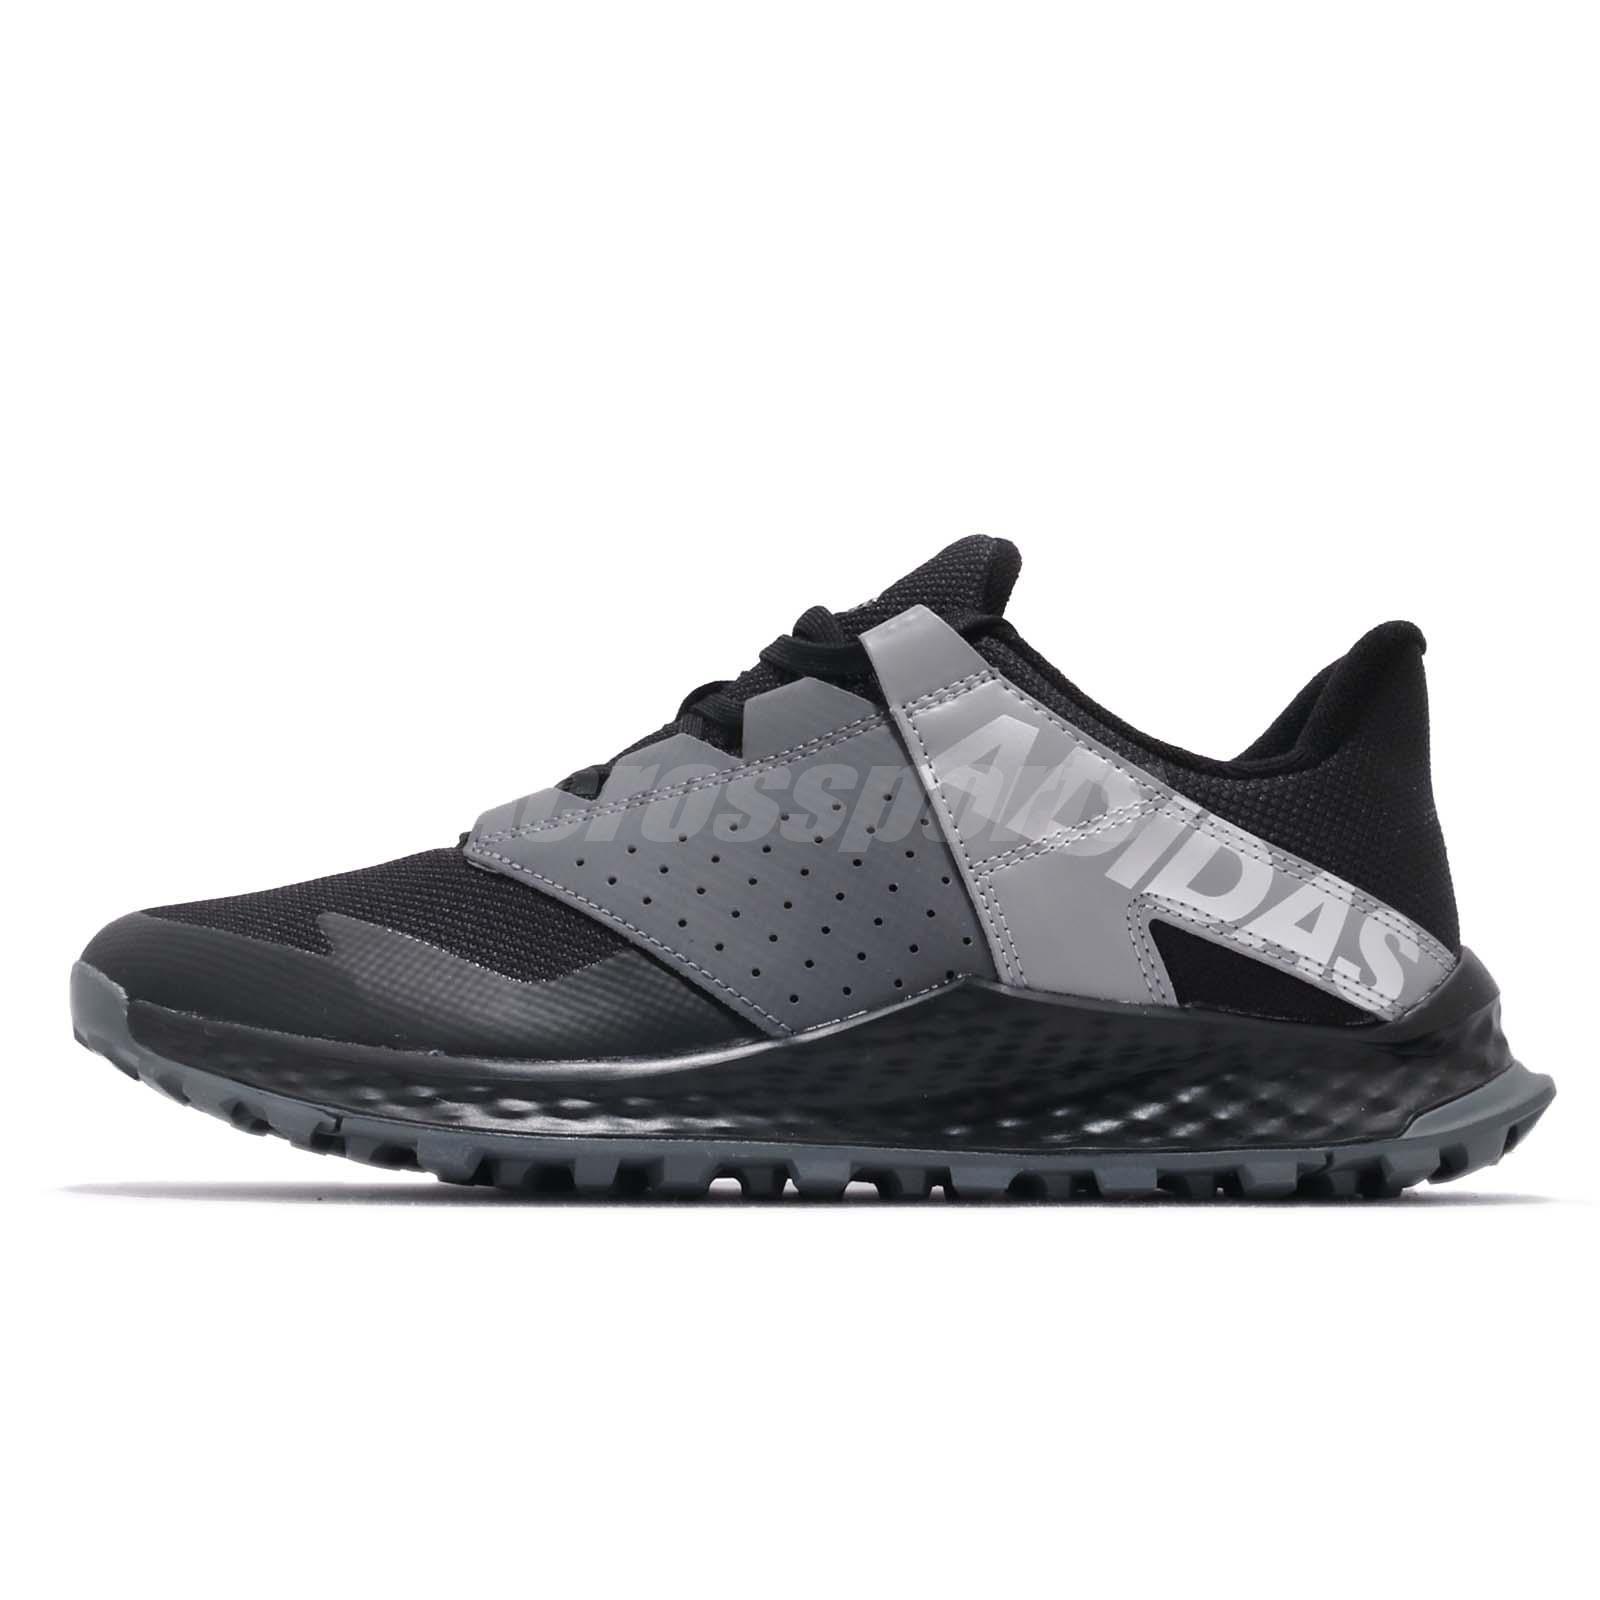 40d8e90e1d4b53 adidas Vigor Bounce K Black Grey Kid Junior Preschool Shoes Sneakers B42320